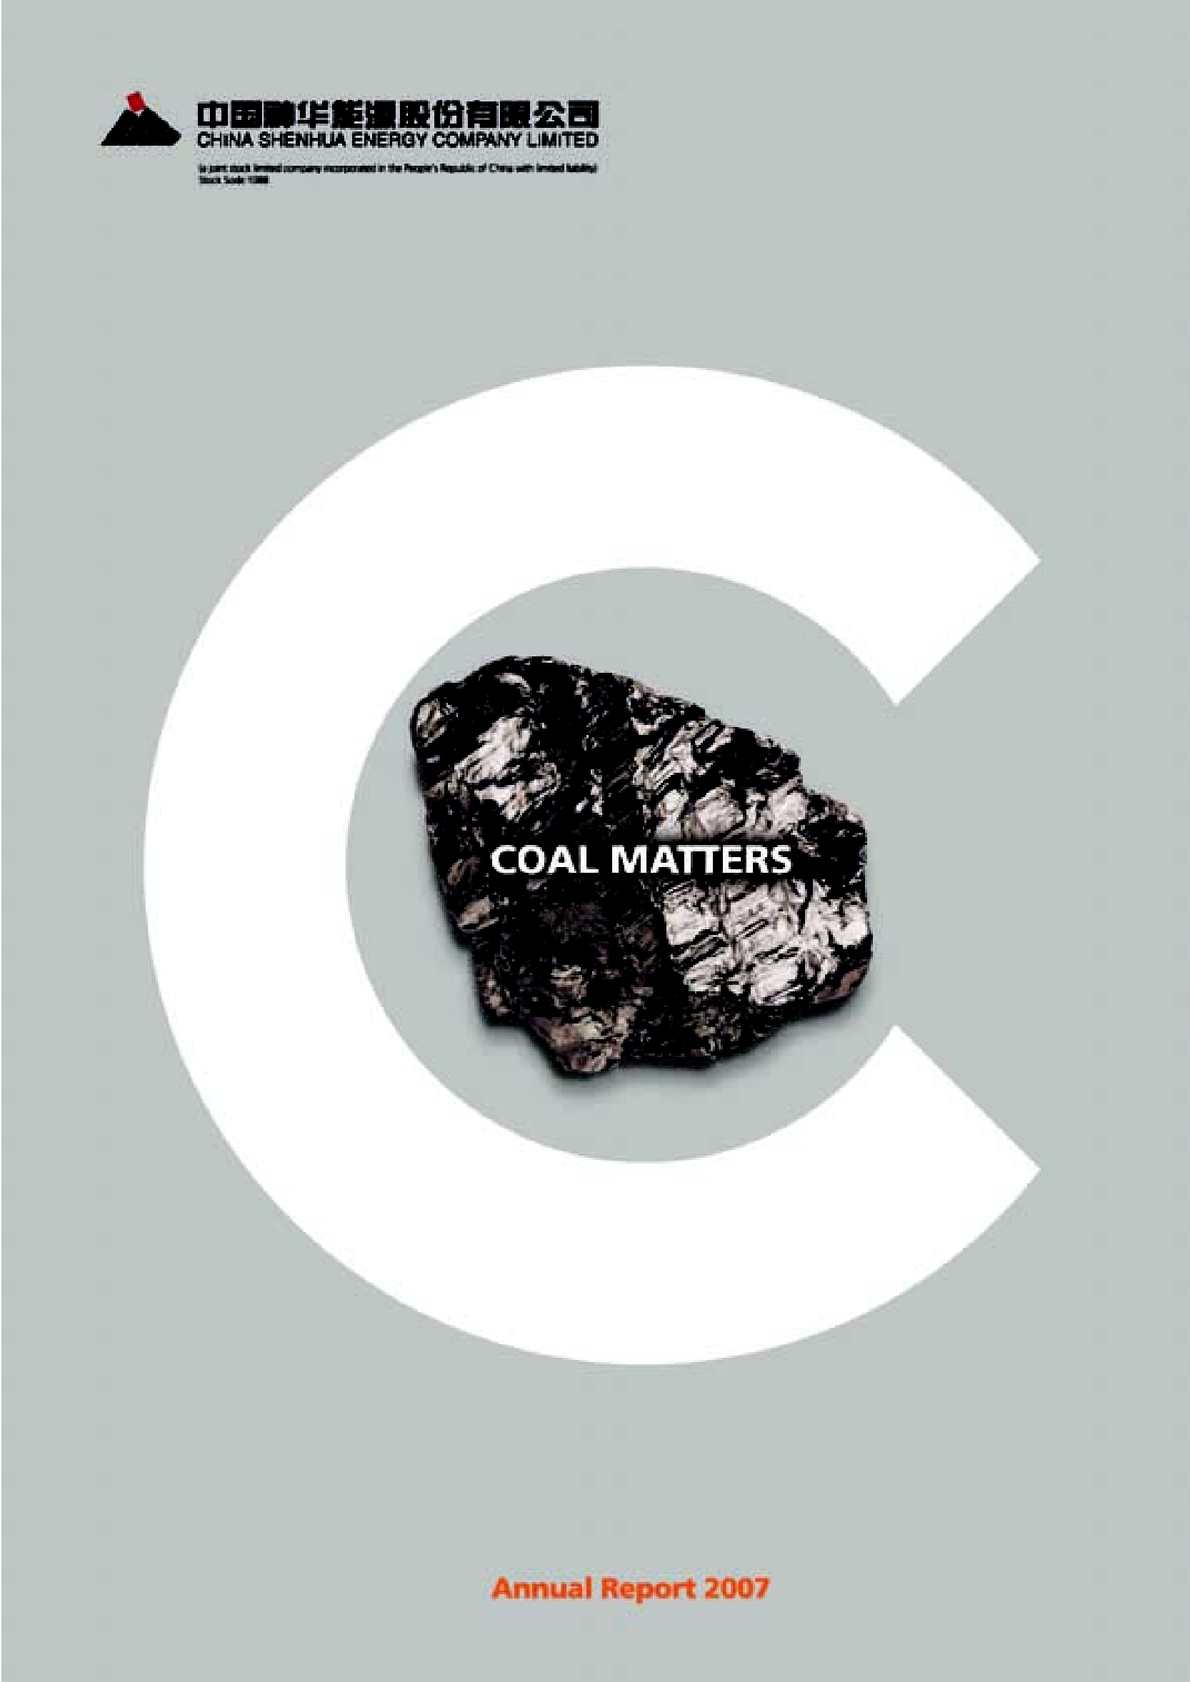 b55e4d08af9f Calaméo - China Shenhua Energy Co. Ltd. Annual Report 2007